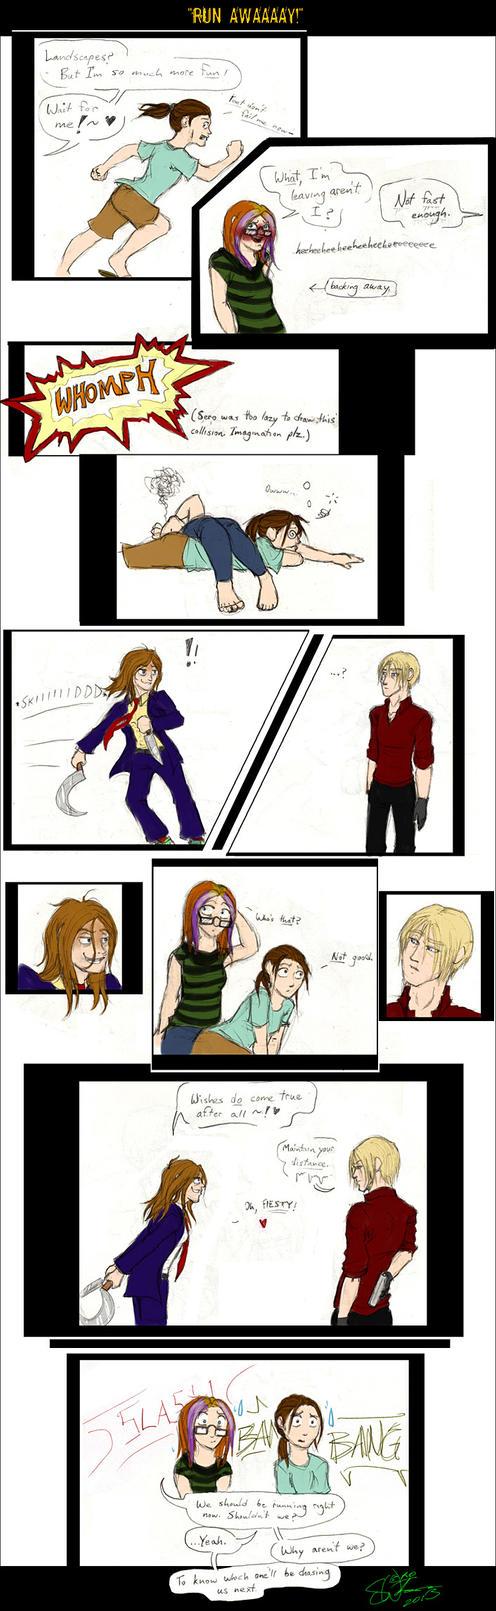 Comic - run AWAAAAY by Absolute-Sero